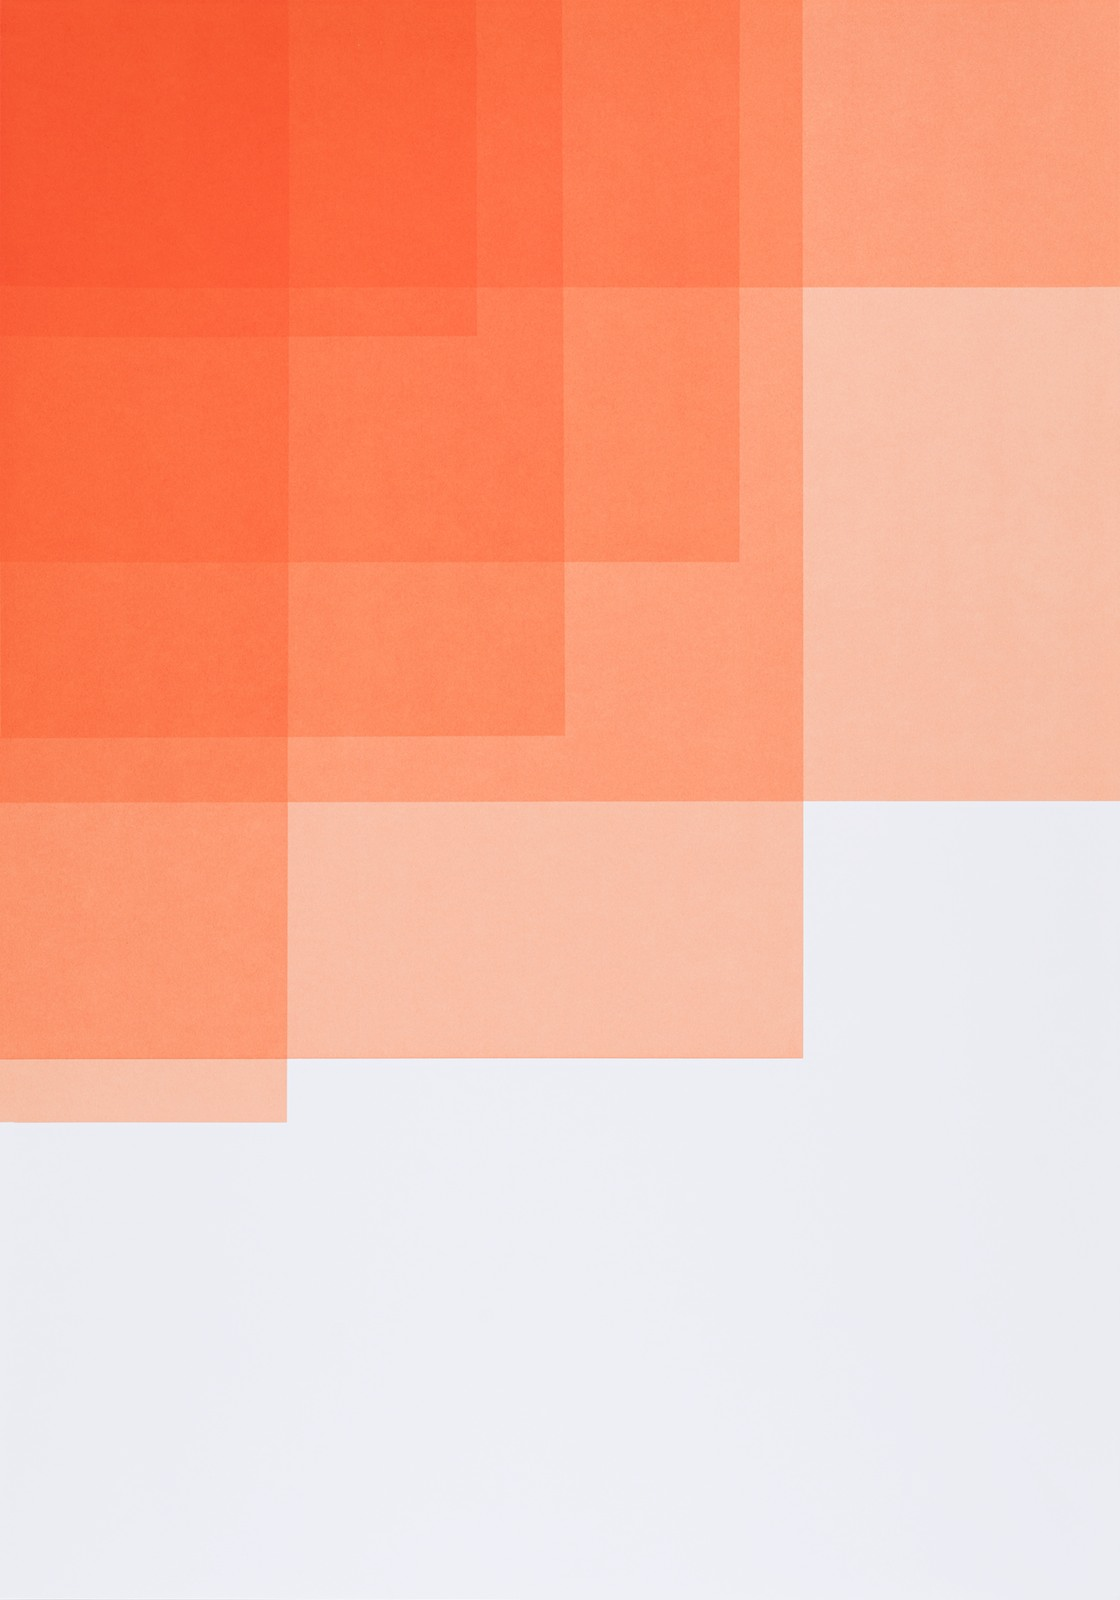 Collecting Colors (Orange I), 2016, silkscreen print, 100 x 70 cm, Ed. 4